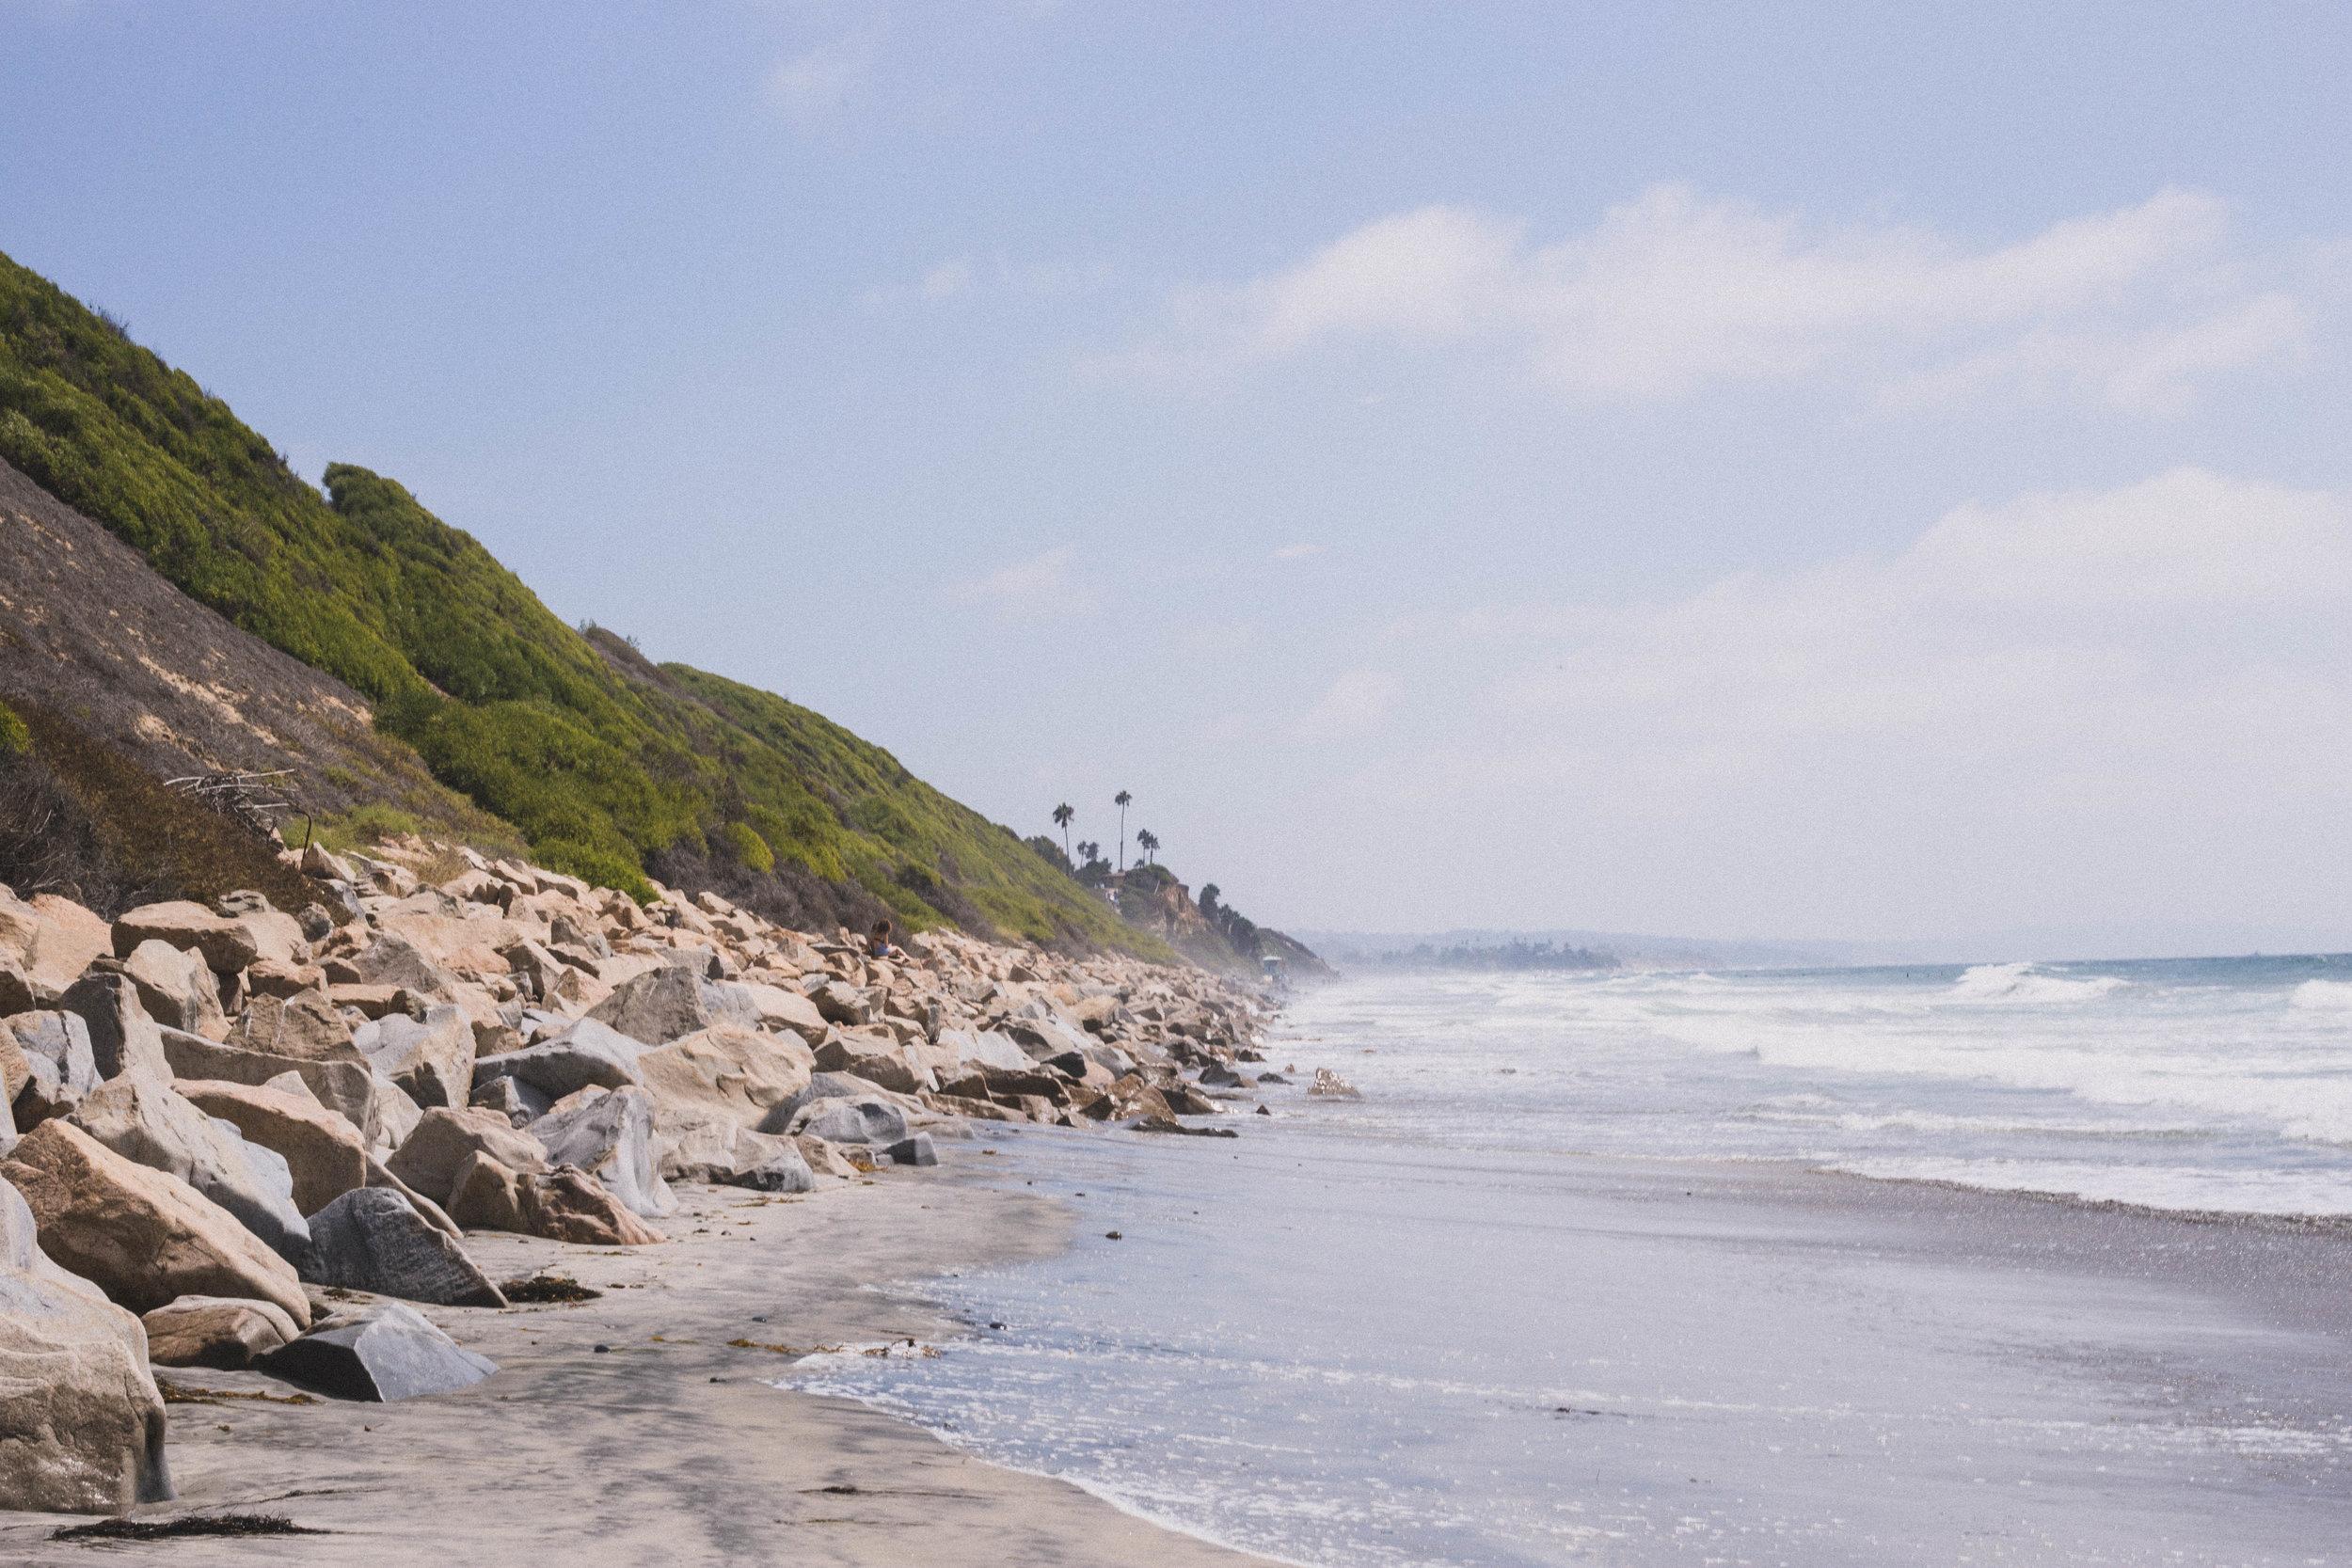 Swamis Beach in Encinatas (City Guide to San Diego)